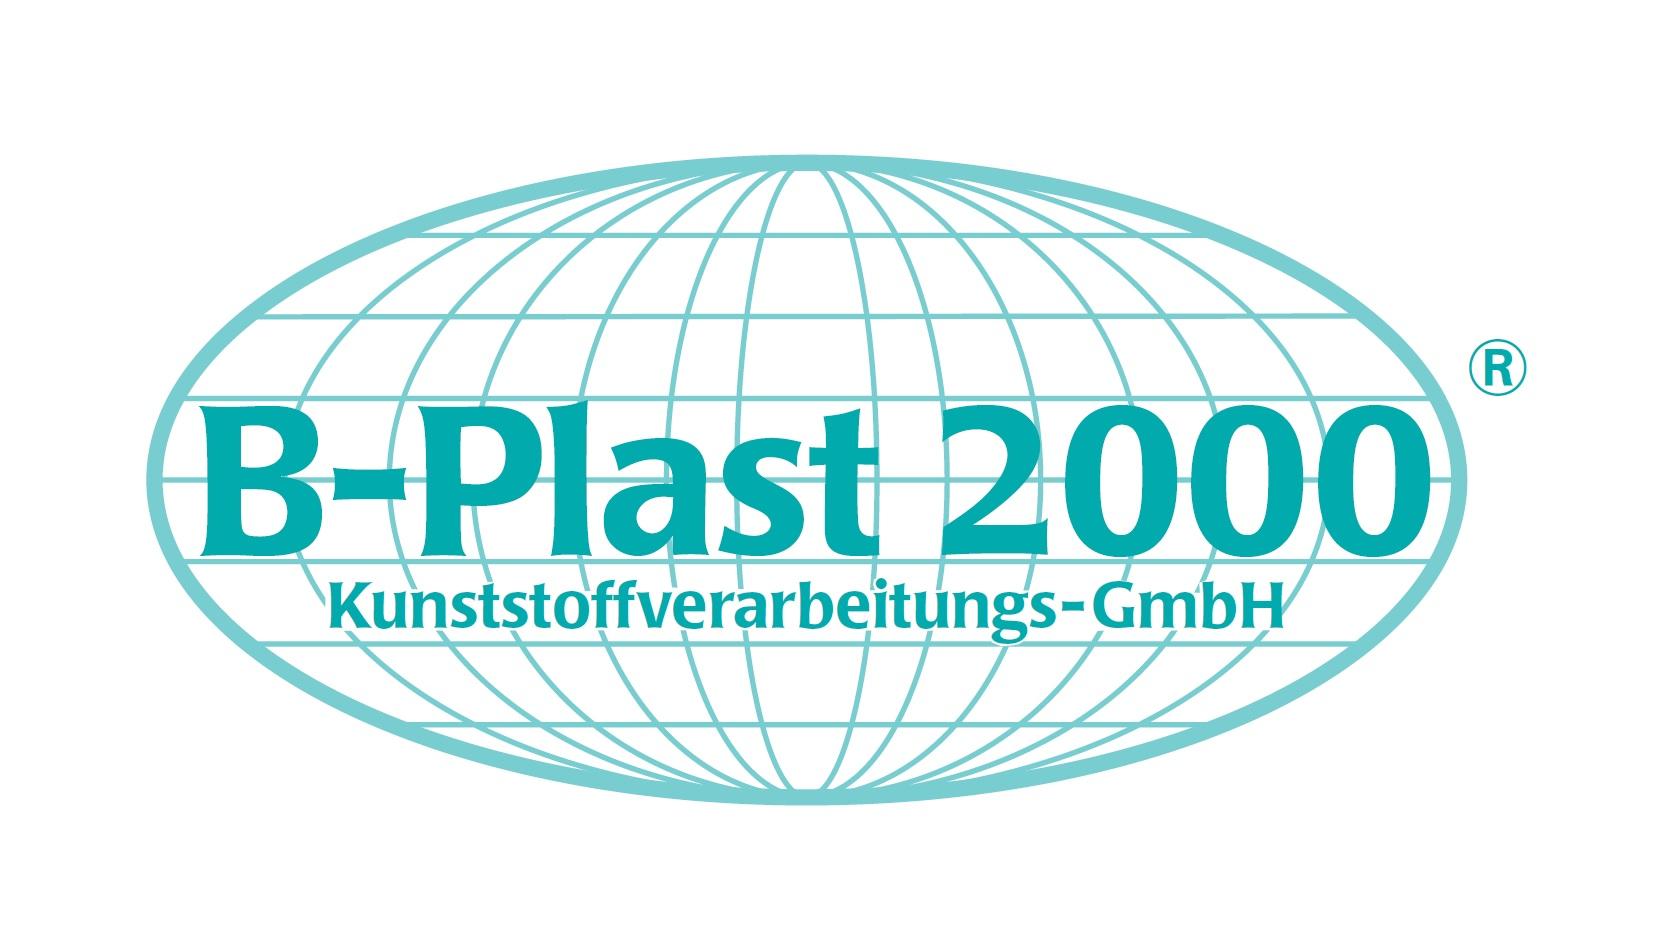 B-Plast 2000 Kunststoffverarbeitungs-GmbH